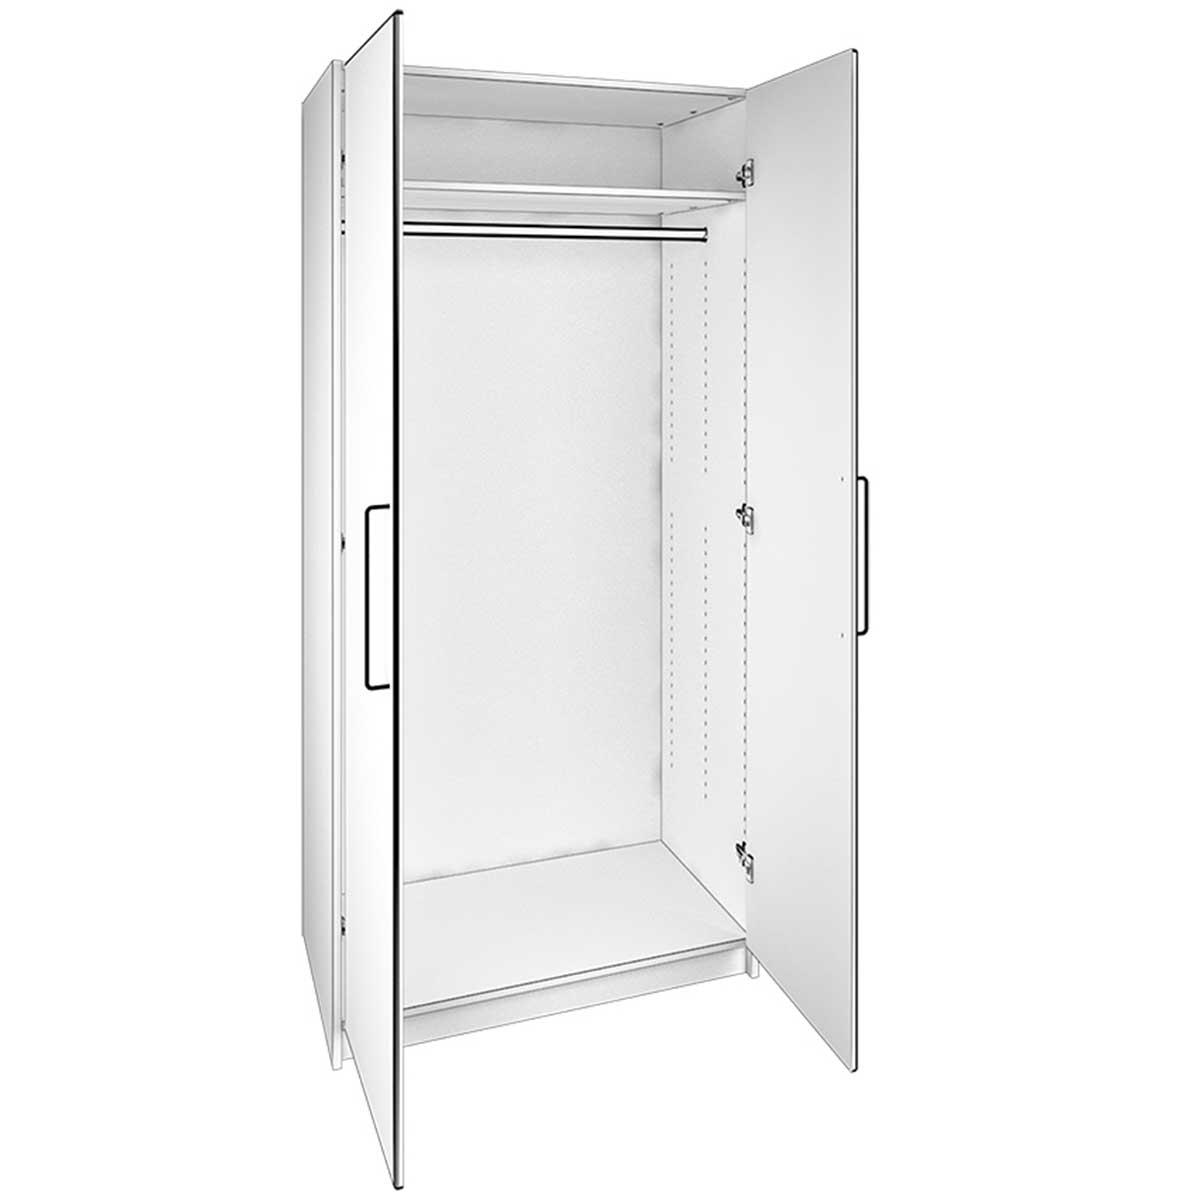 Køb Kaagaard Garderobeskab 2 lÃ¥ger 2082 82x216x62 hvid